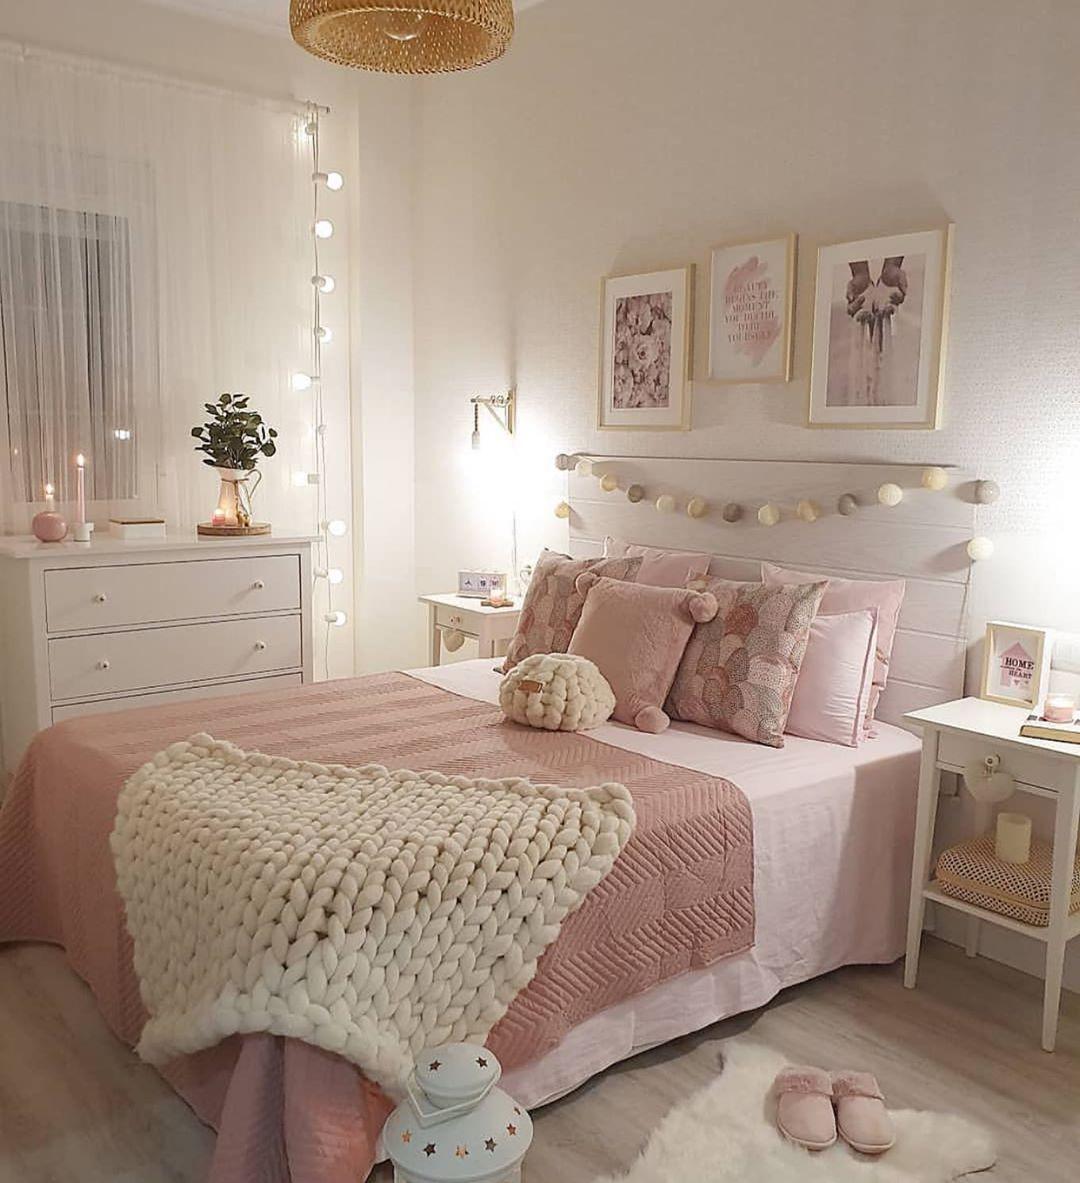 Photo of #soft #cozy #bed #bedroomdesign #bedroomdecor #interior